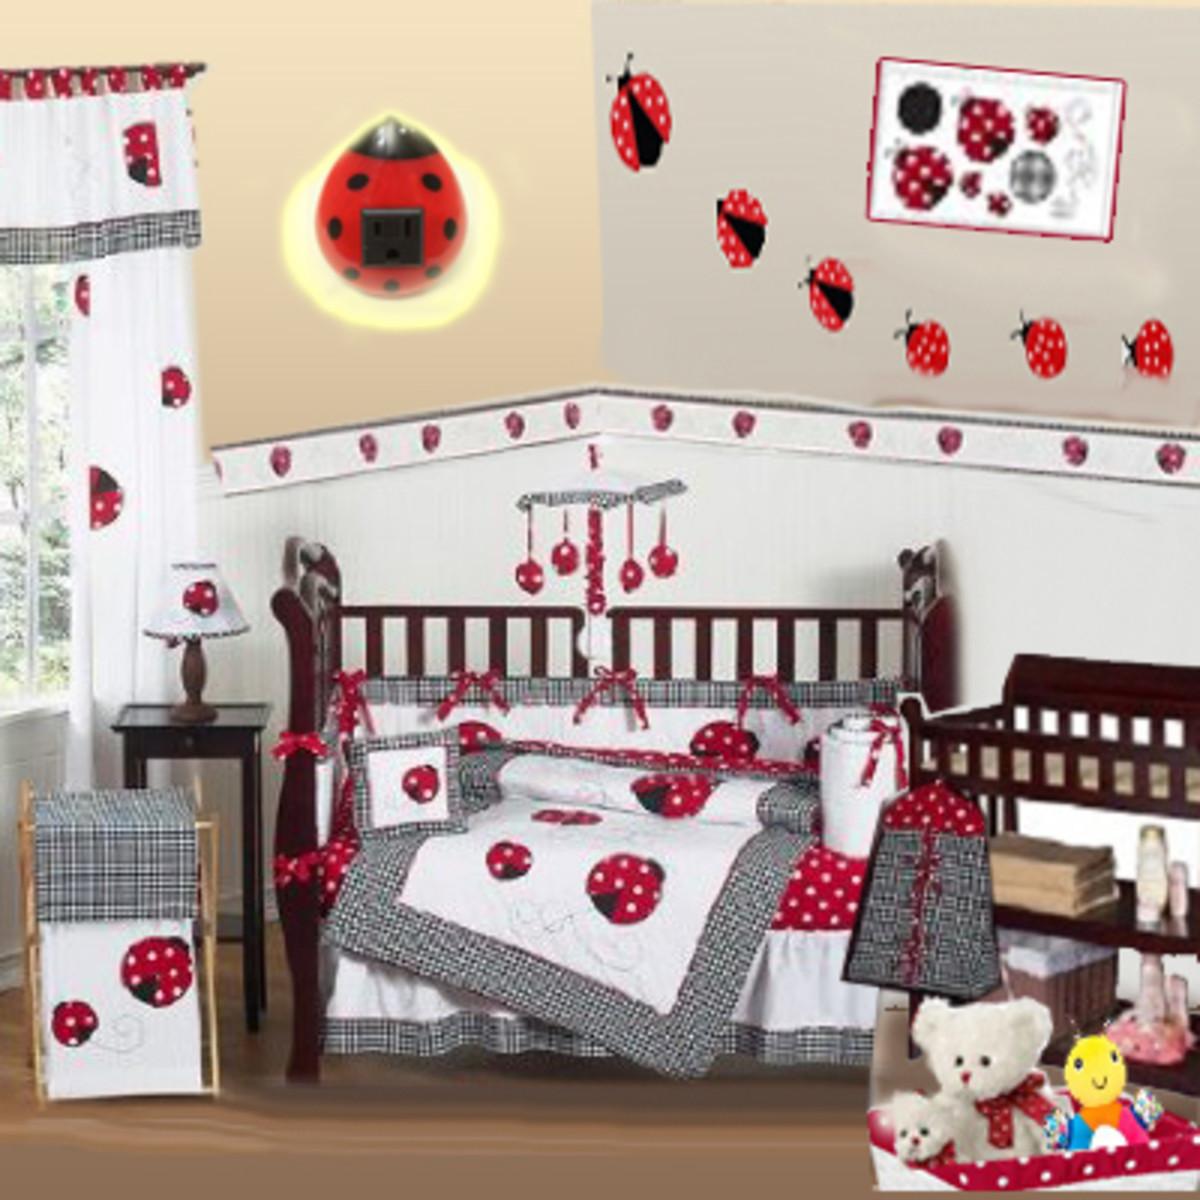 nursery-decorating-ideas-on-low-budget